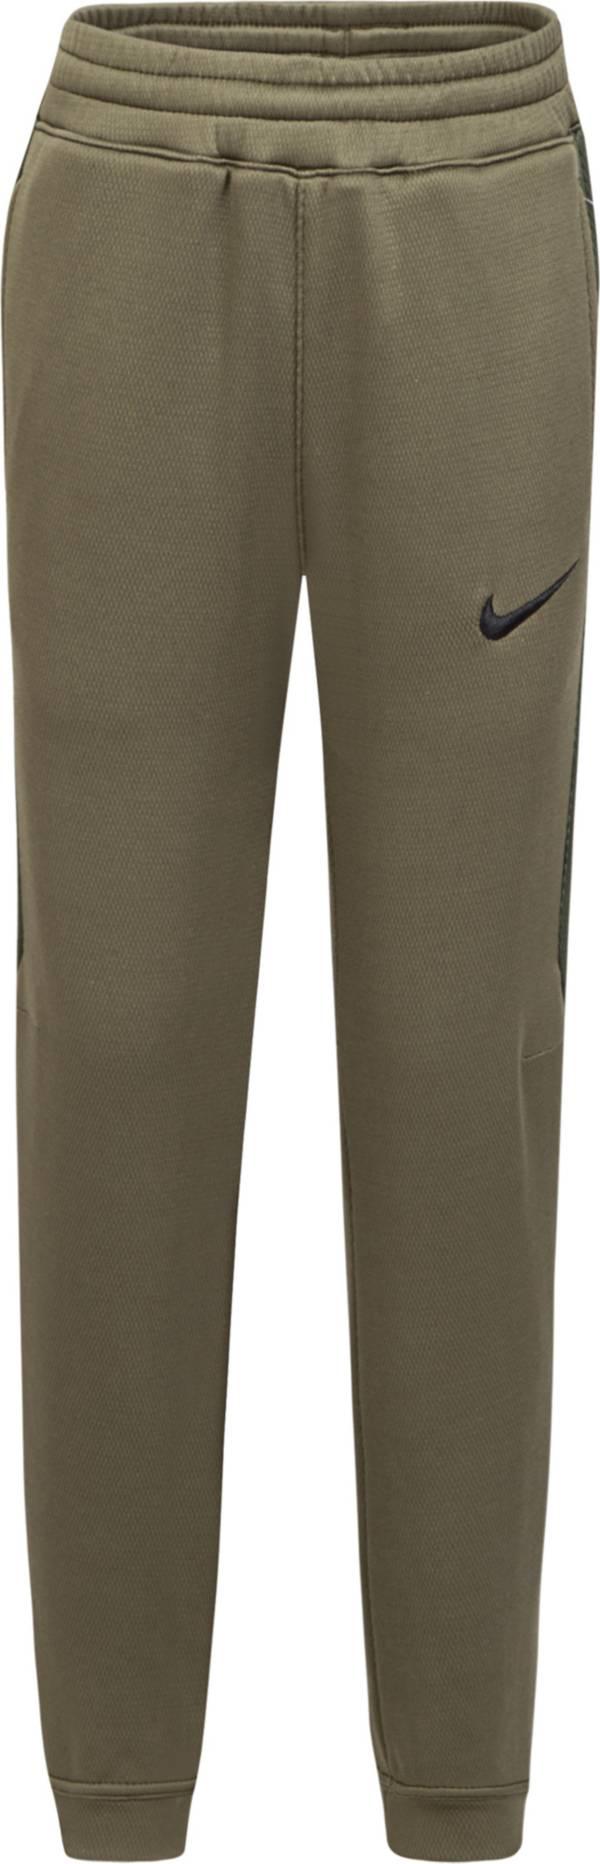 Nike Little Boys' Therma Fleece Cuffed Pants product image